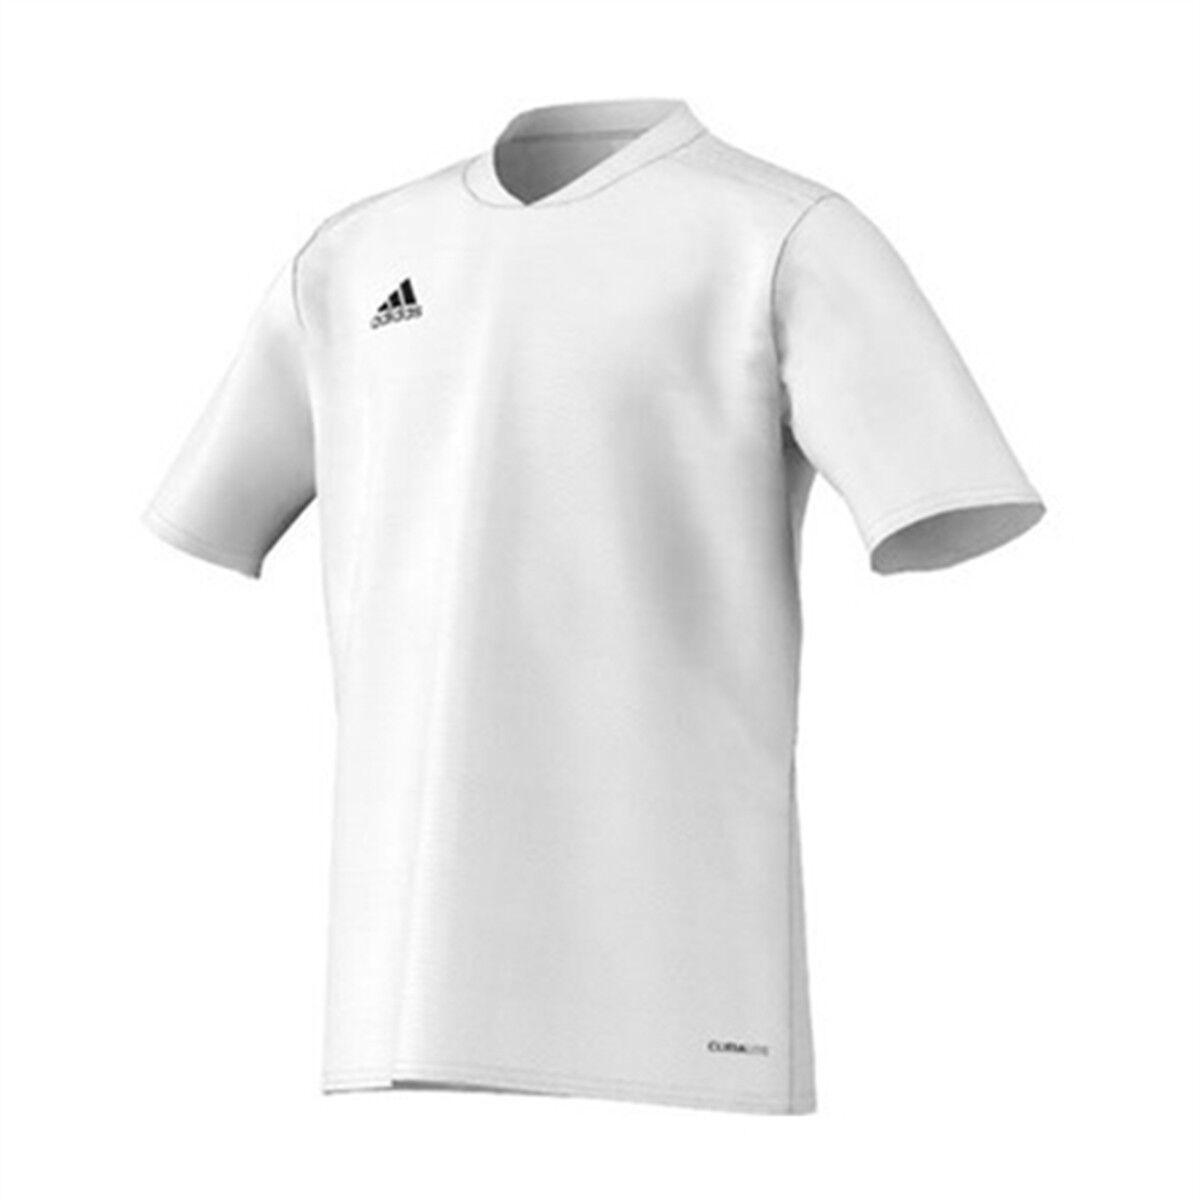 Adidas Kids Youth Tabe 11 Jersey White Short Sleeve T-Shirt